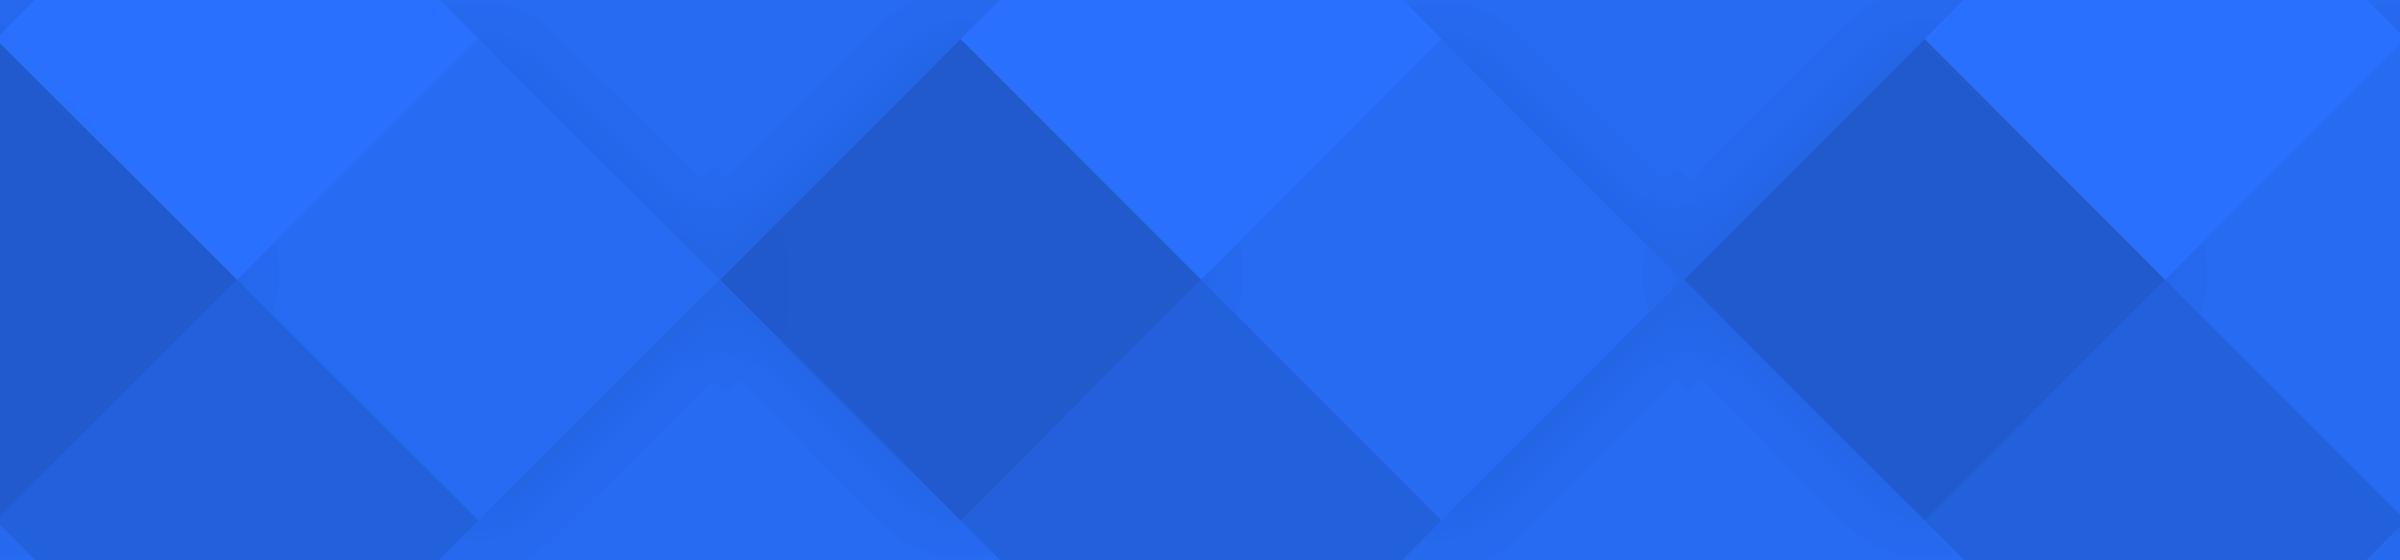 op_designcover280x1200